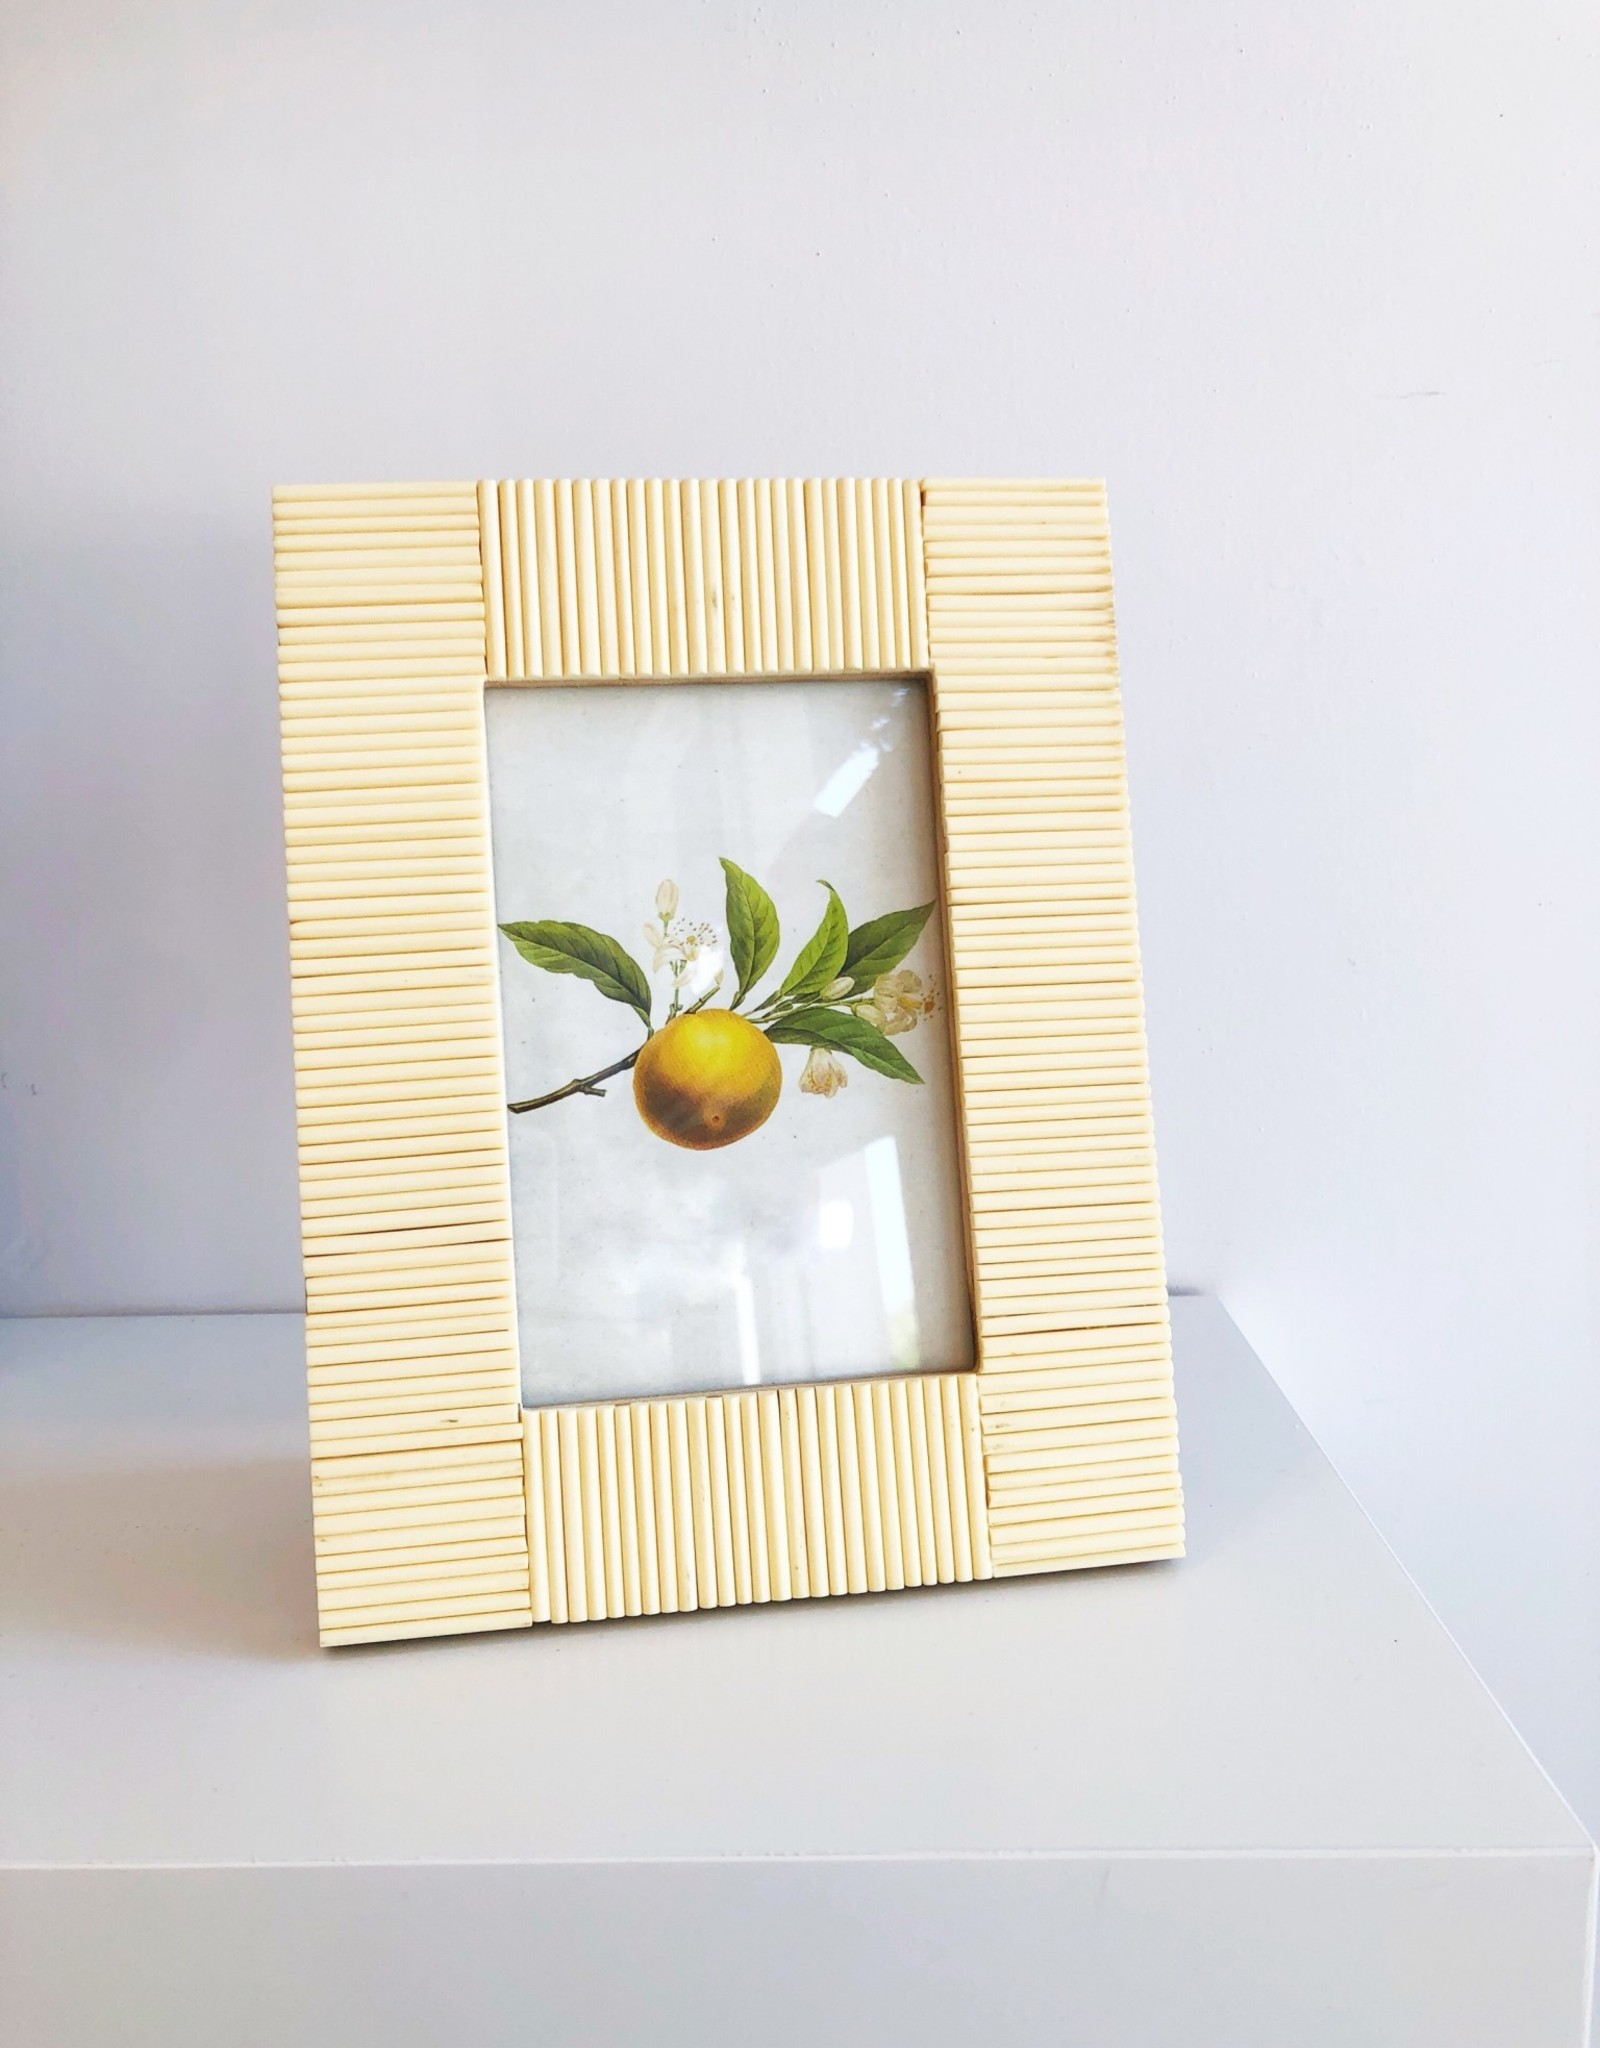 Textured Resin Photo Frame - 4x6